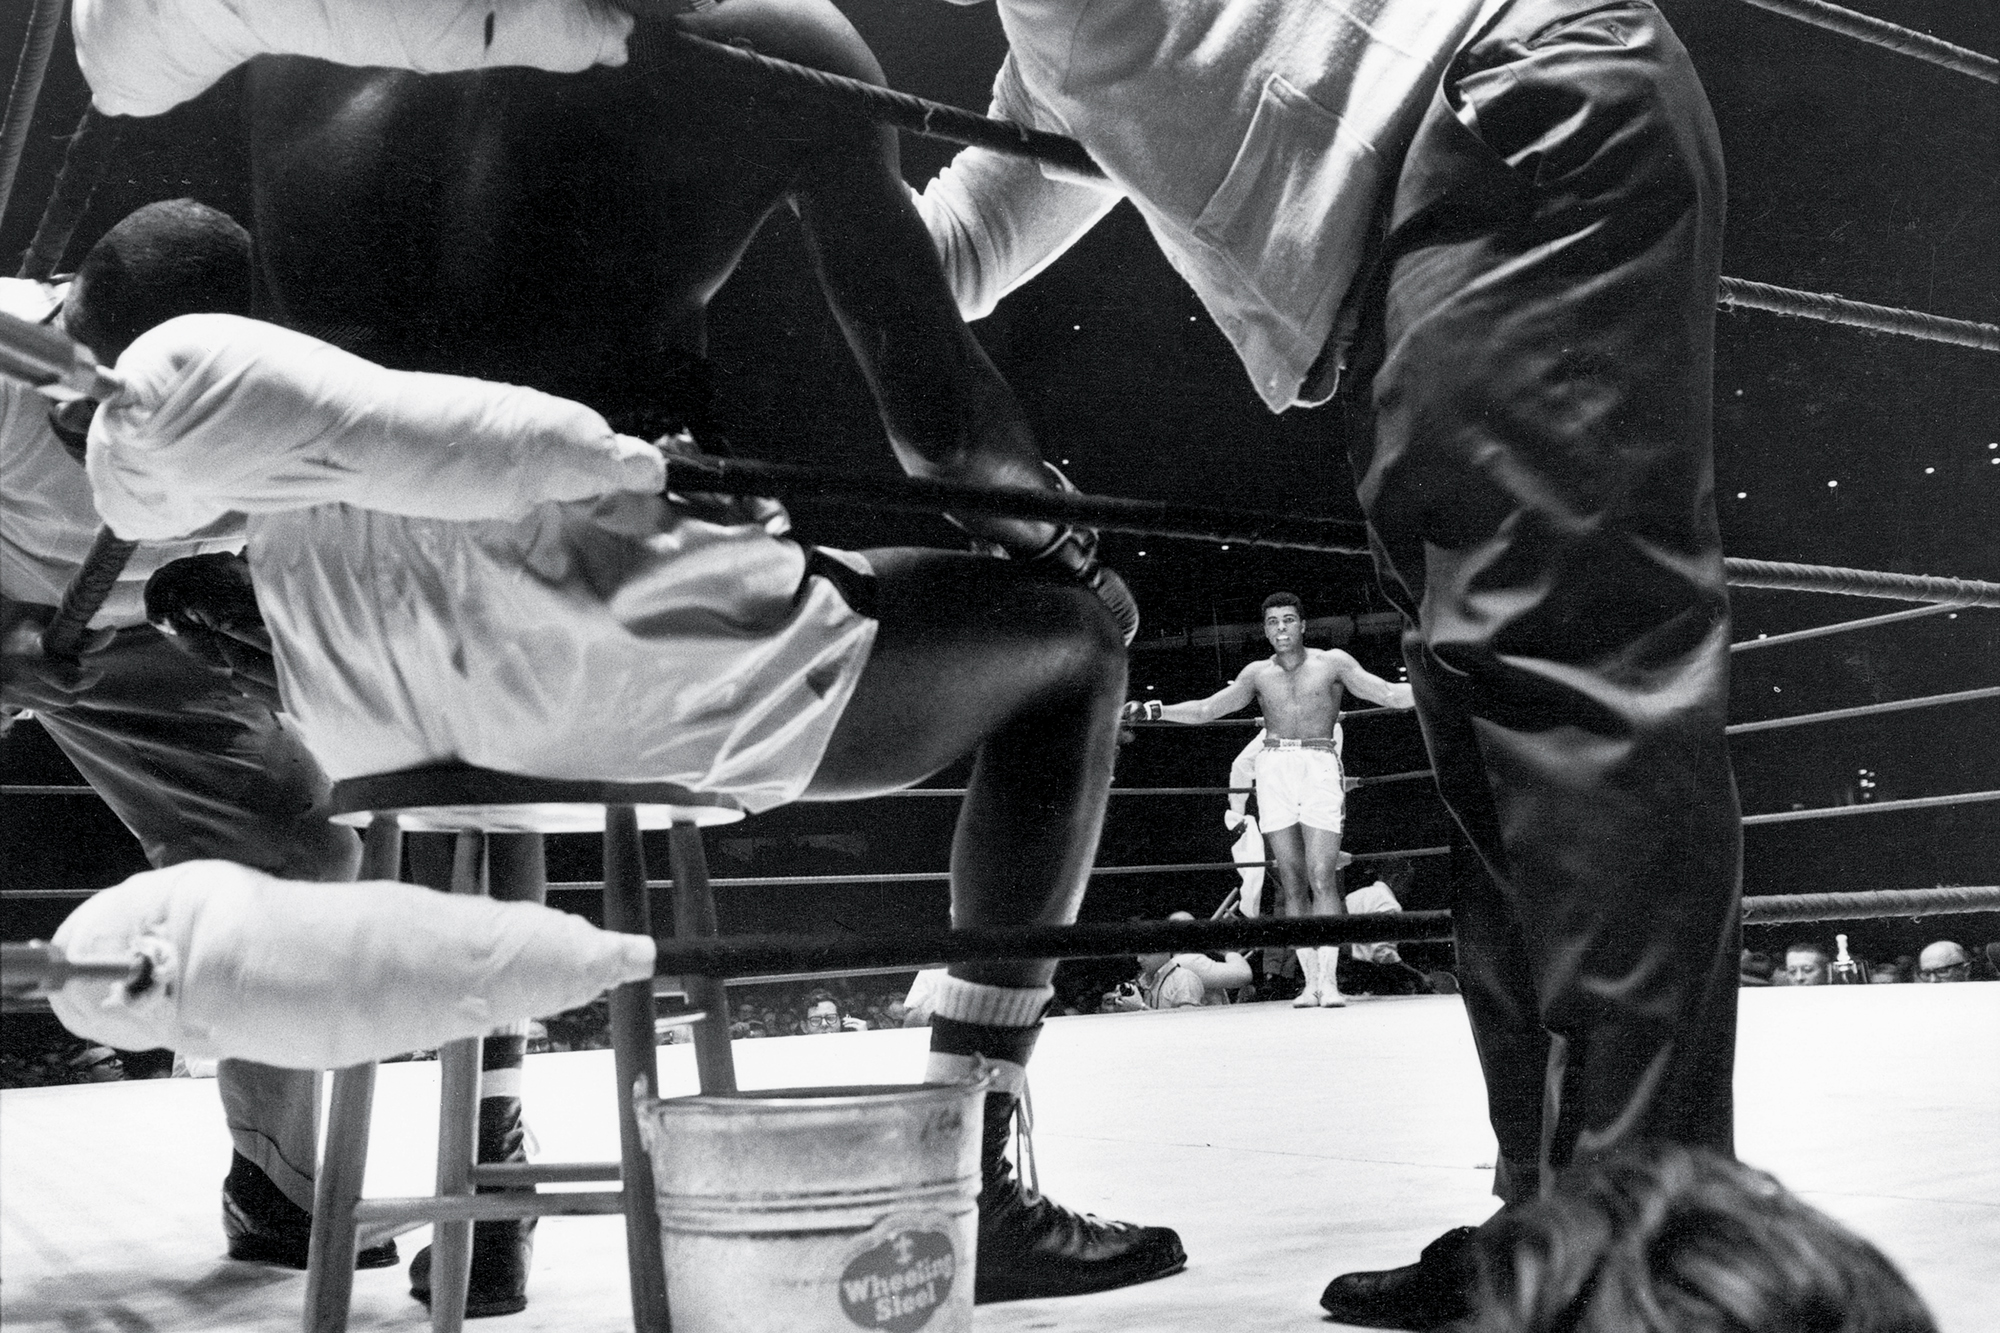 Muhammad Ali & Earnie Terrell, 1967